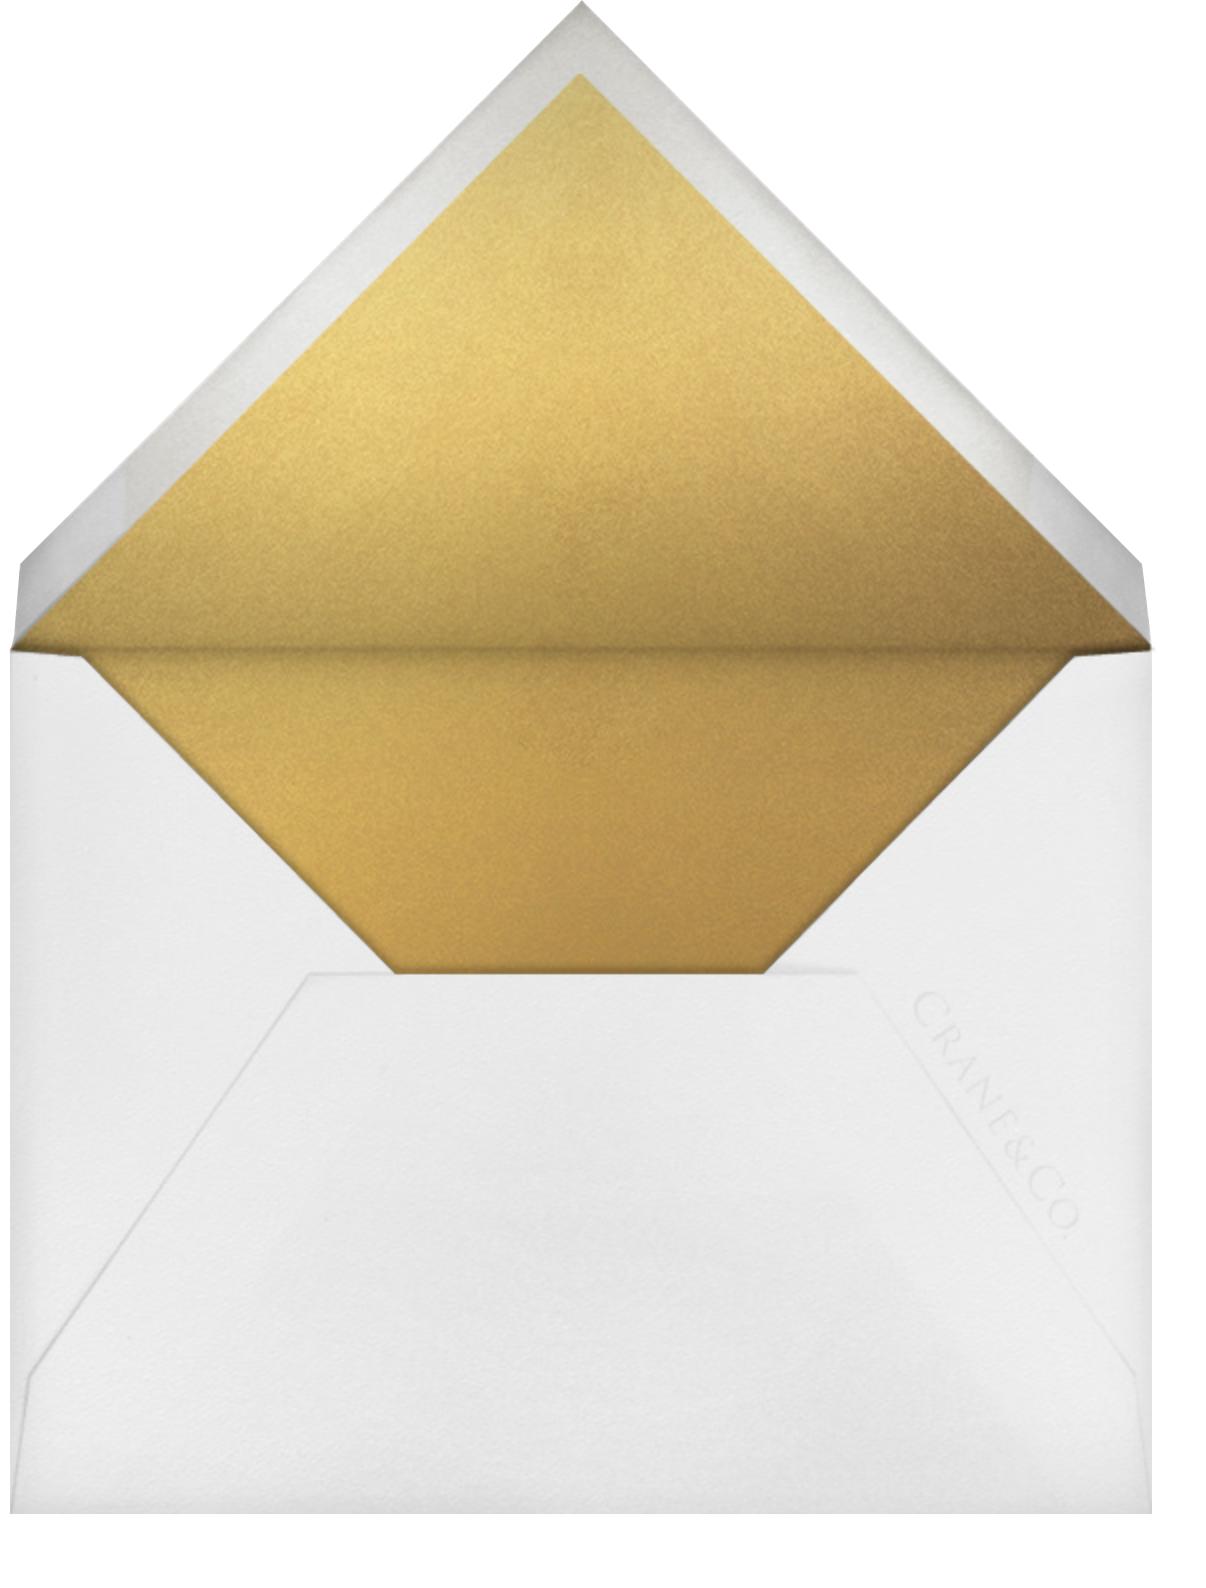 Notch (Stationery) - Gold - Vera Wang - Personalized stationery - envelope back